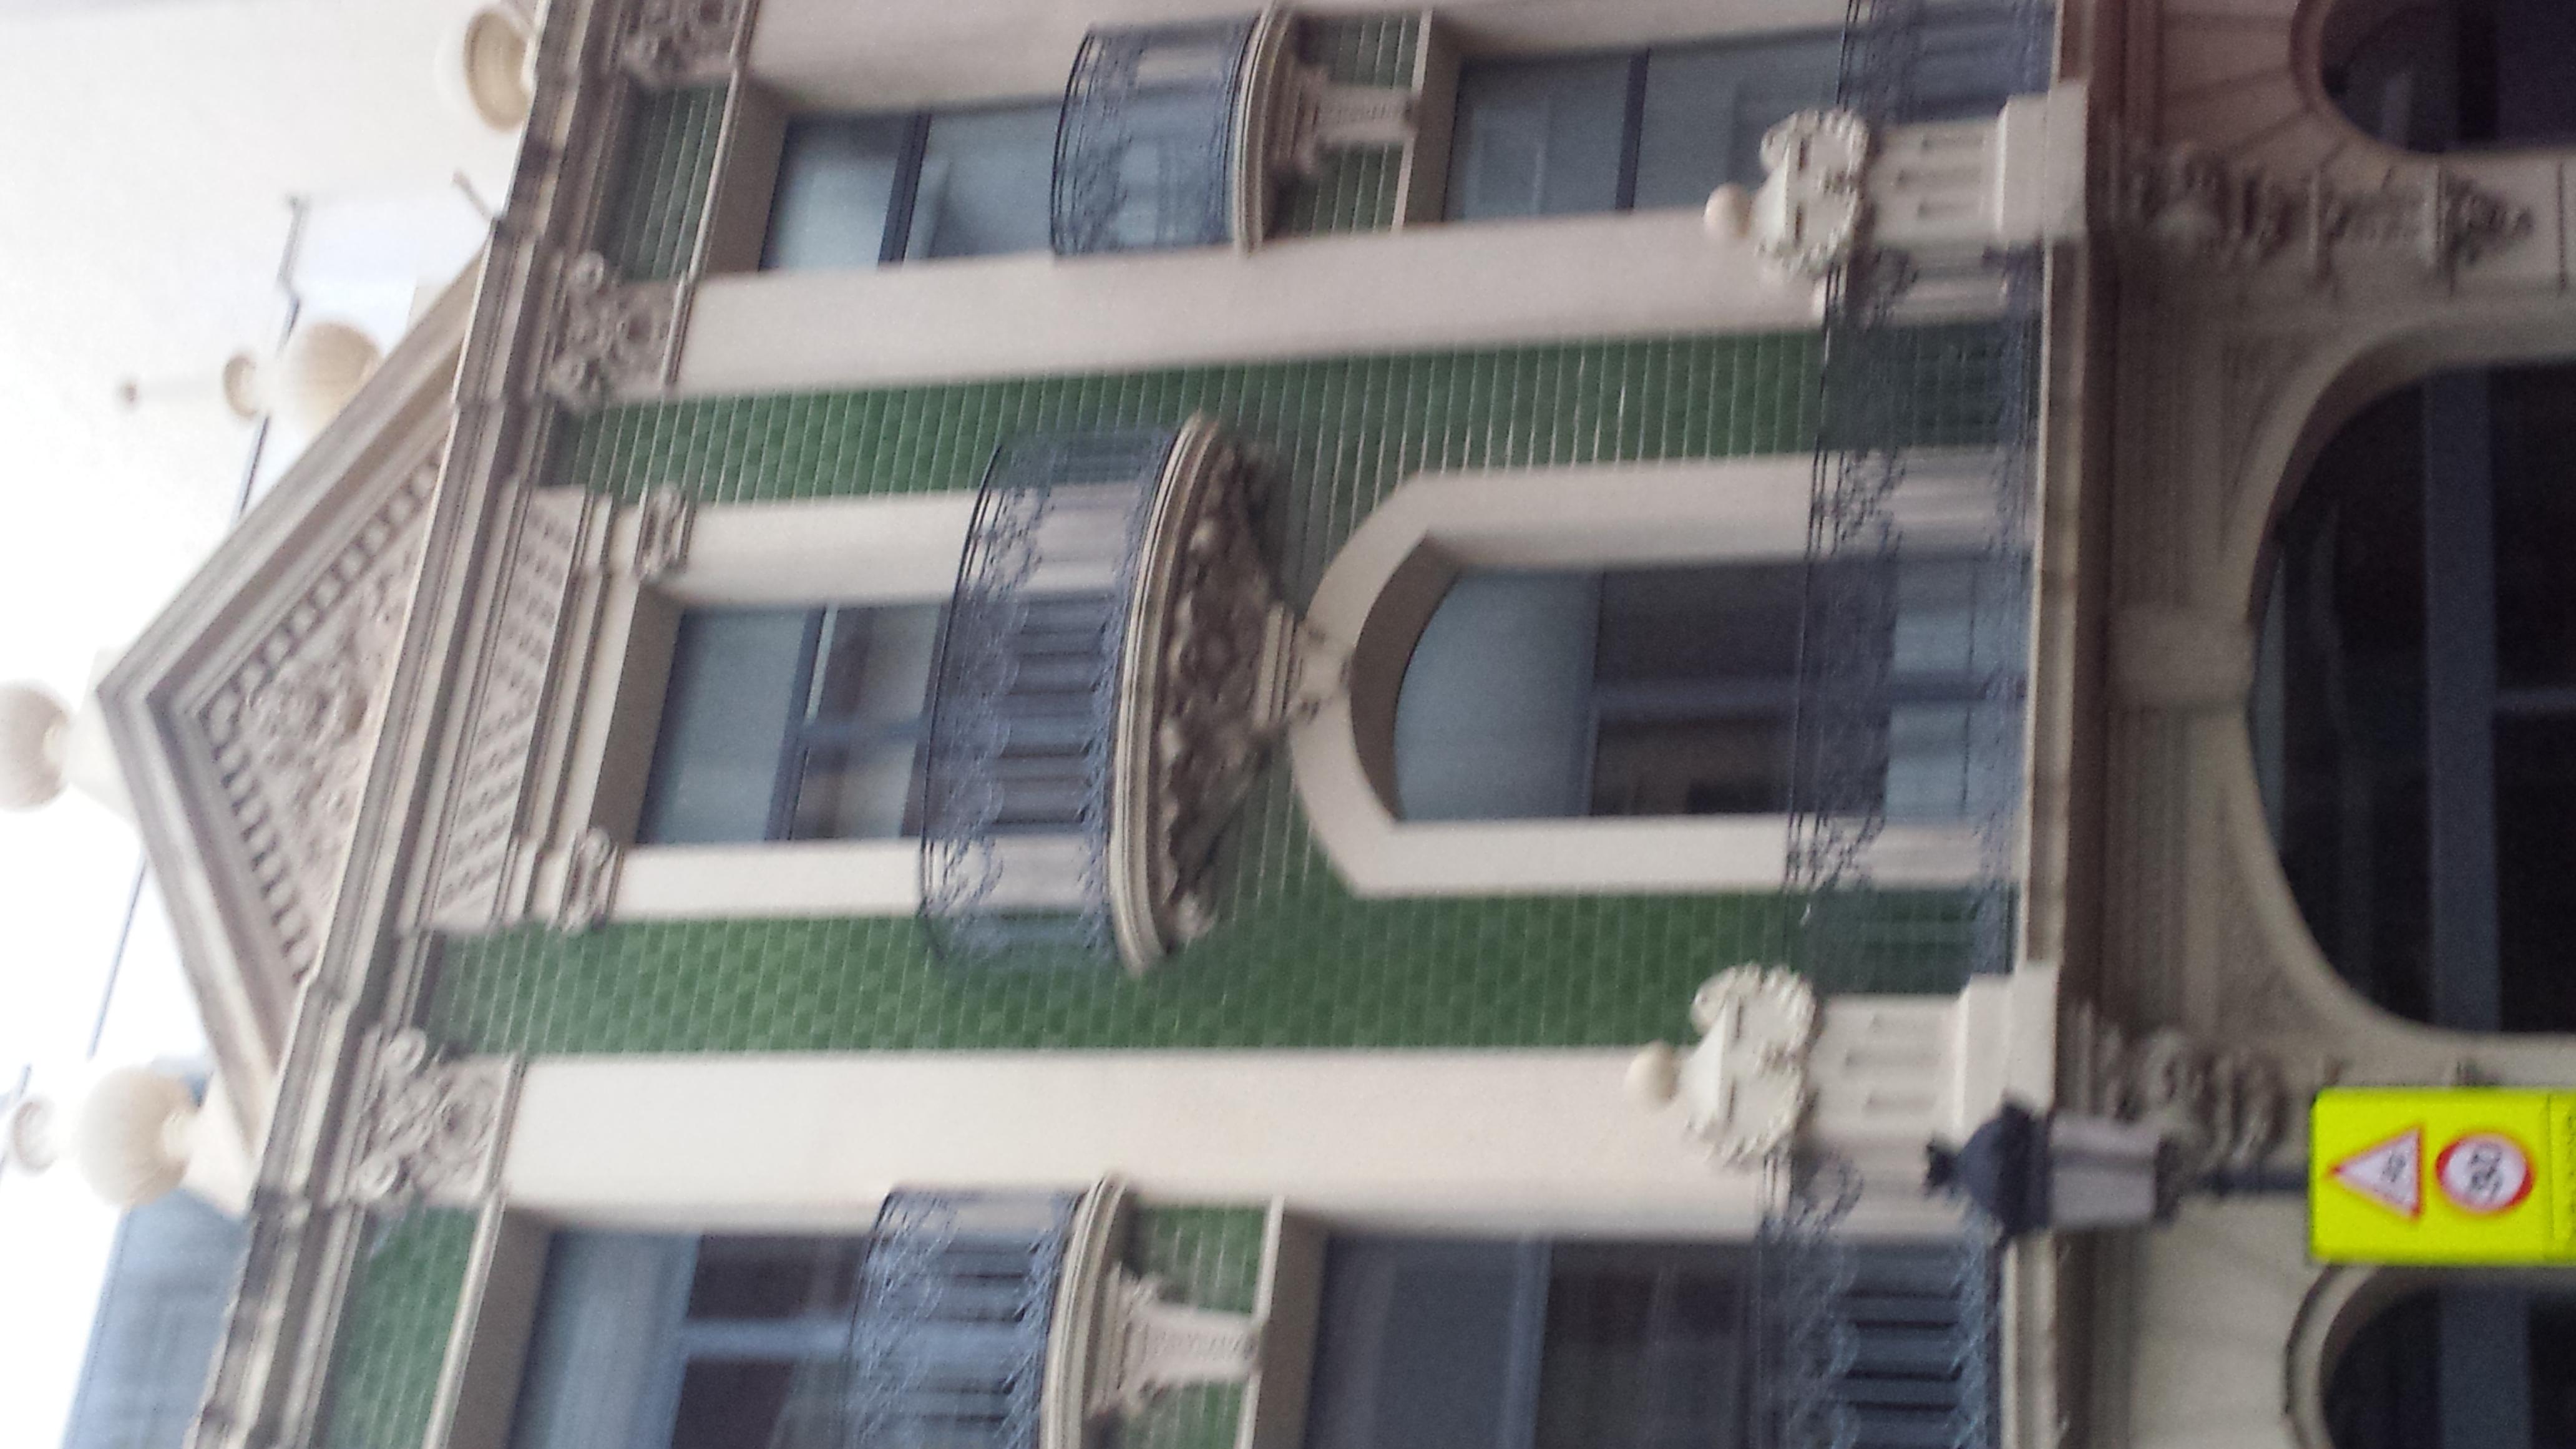 Colegio de arquitectos albacete wikiwand - Colegio de arquitectos toledo ...